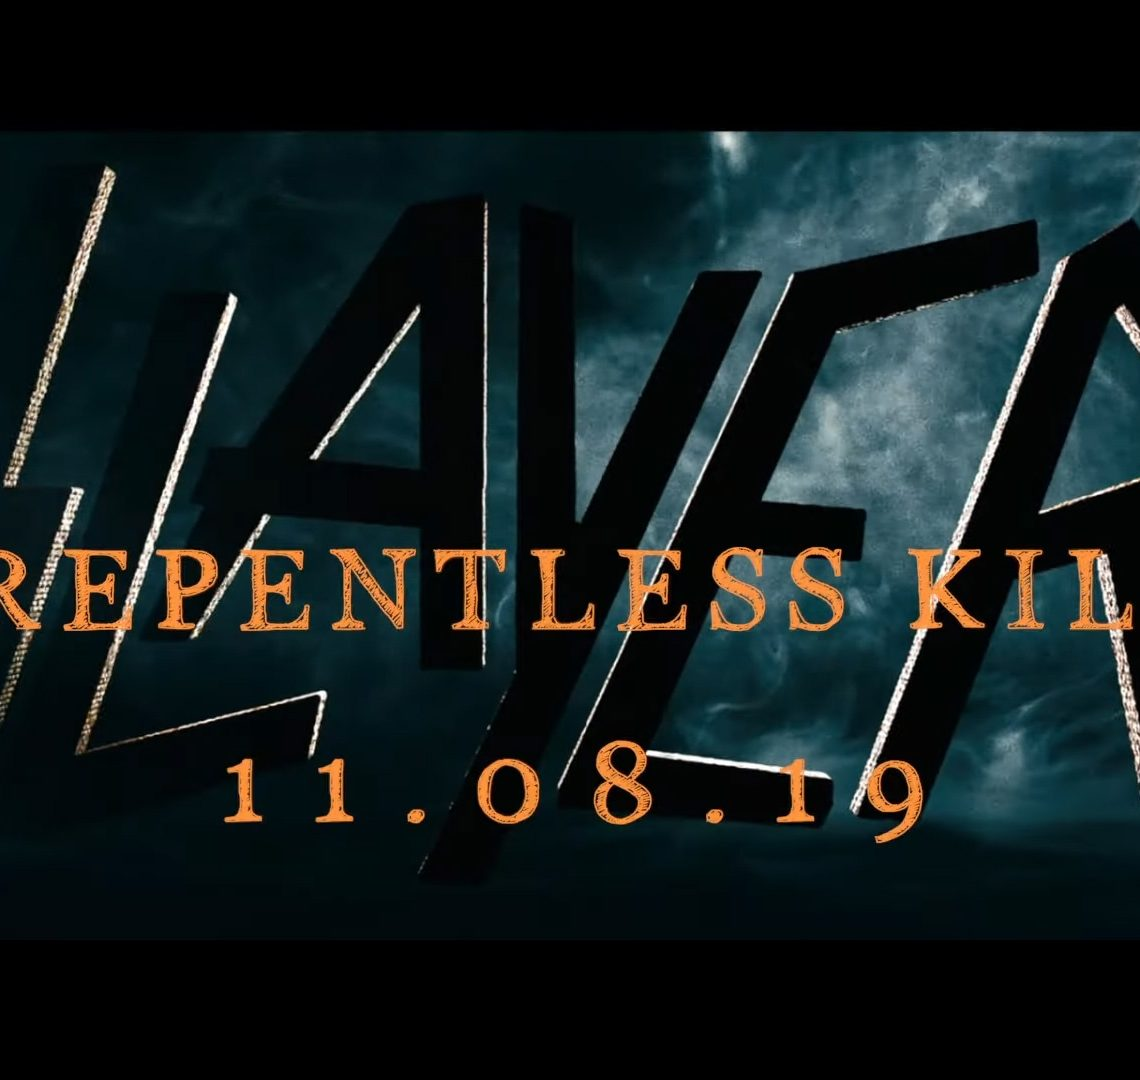 SLAYER to screen 'The Repentless Killogy' in cinemas worldwide